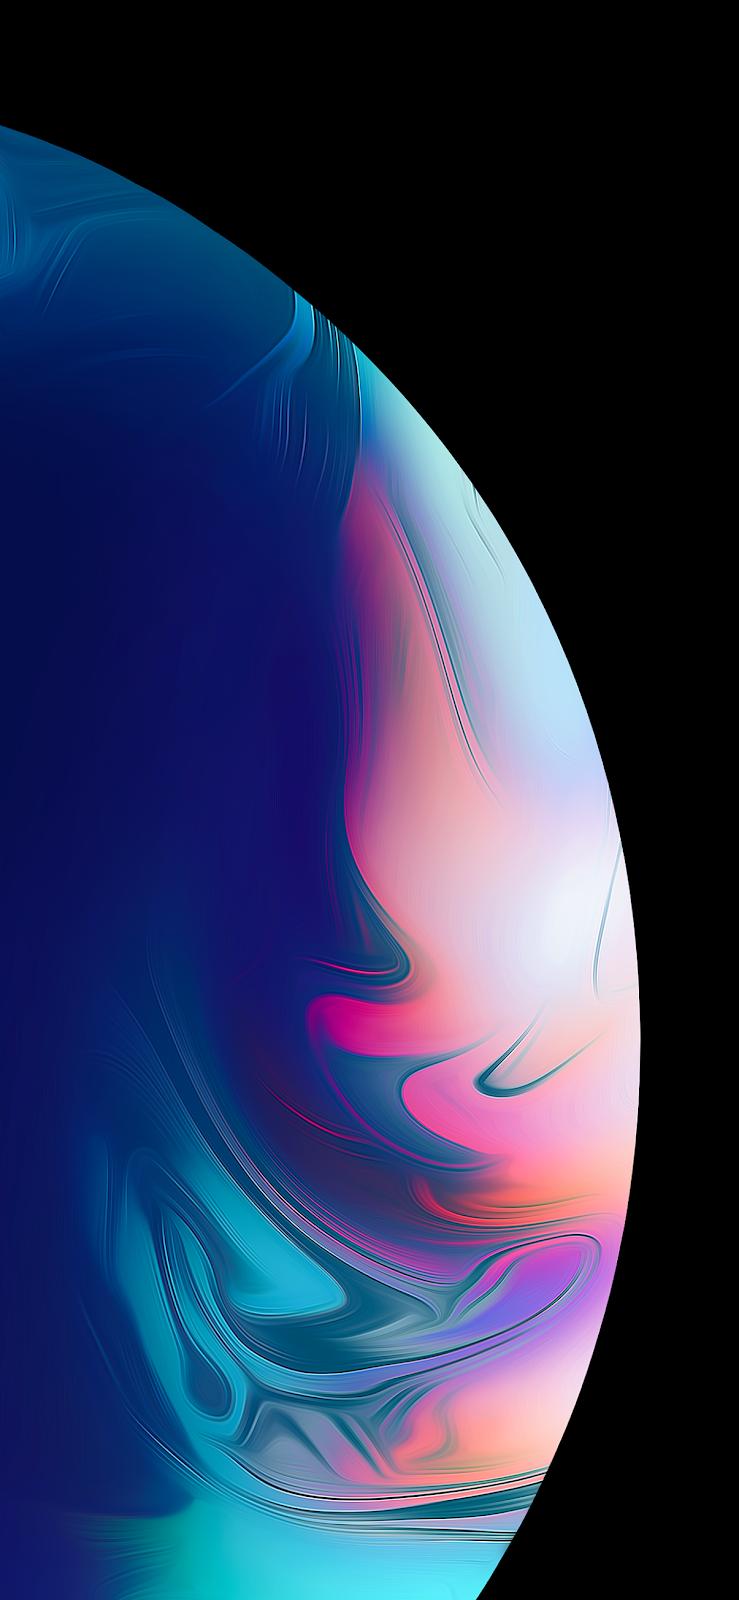 Iphone Xr Wallpaper 4k Download